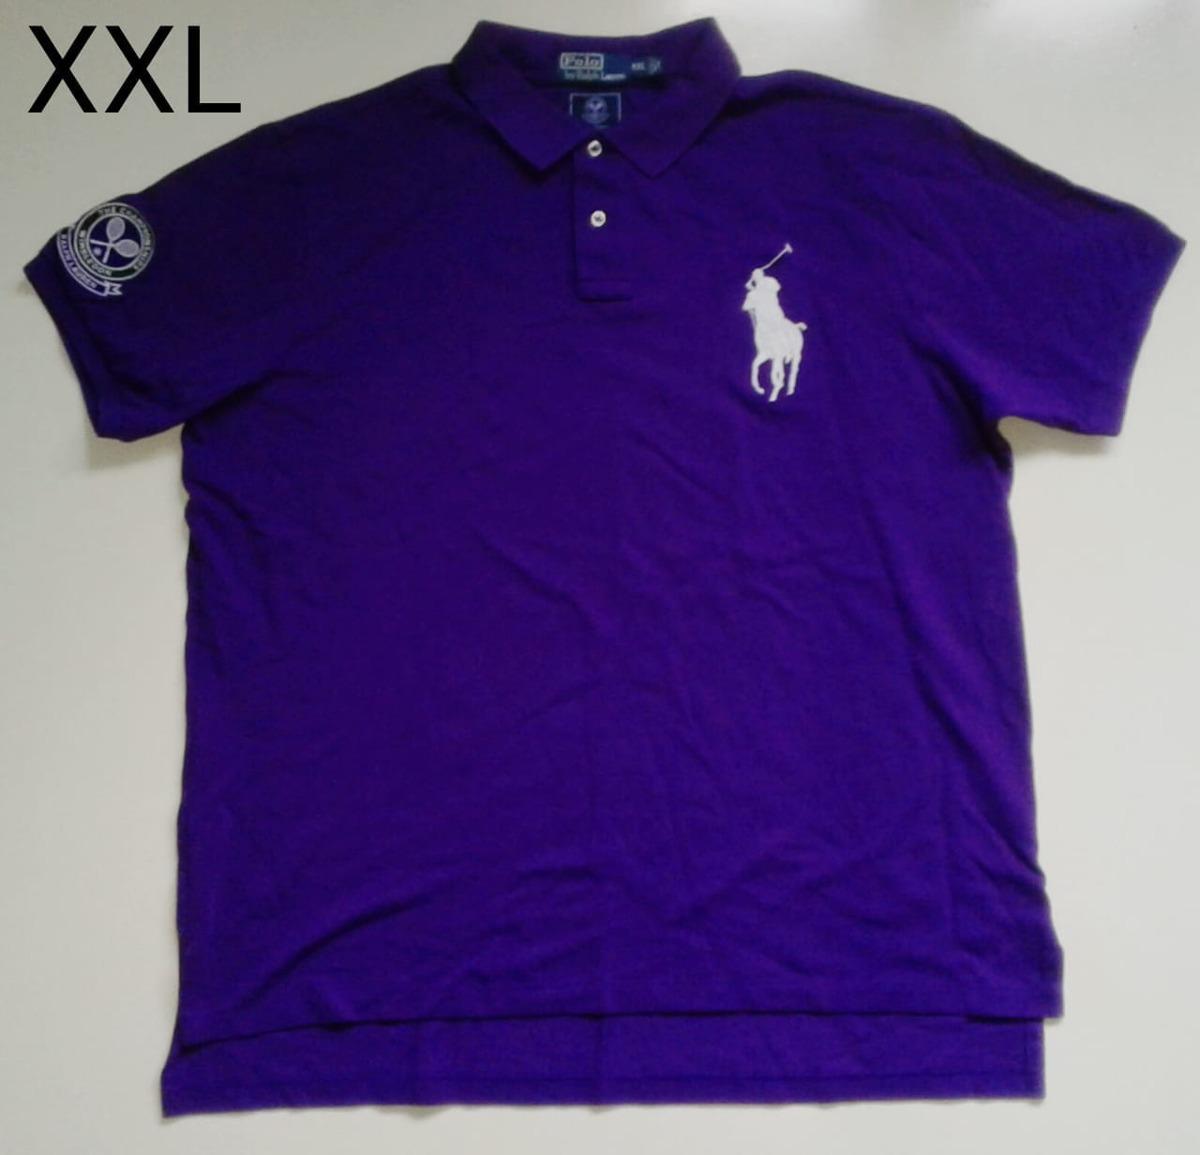 f7759e0ef7213 3cb94 7e14f  order camiseta polo ralph lauren americana para hombre talla  xxl. cargando zoom. 6f0e6 55d3f